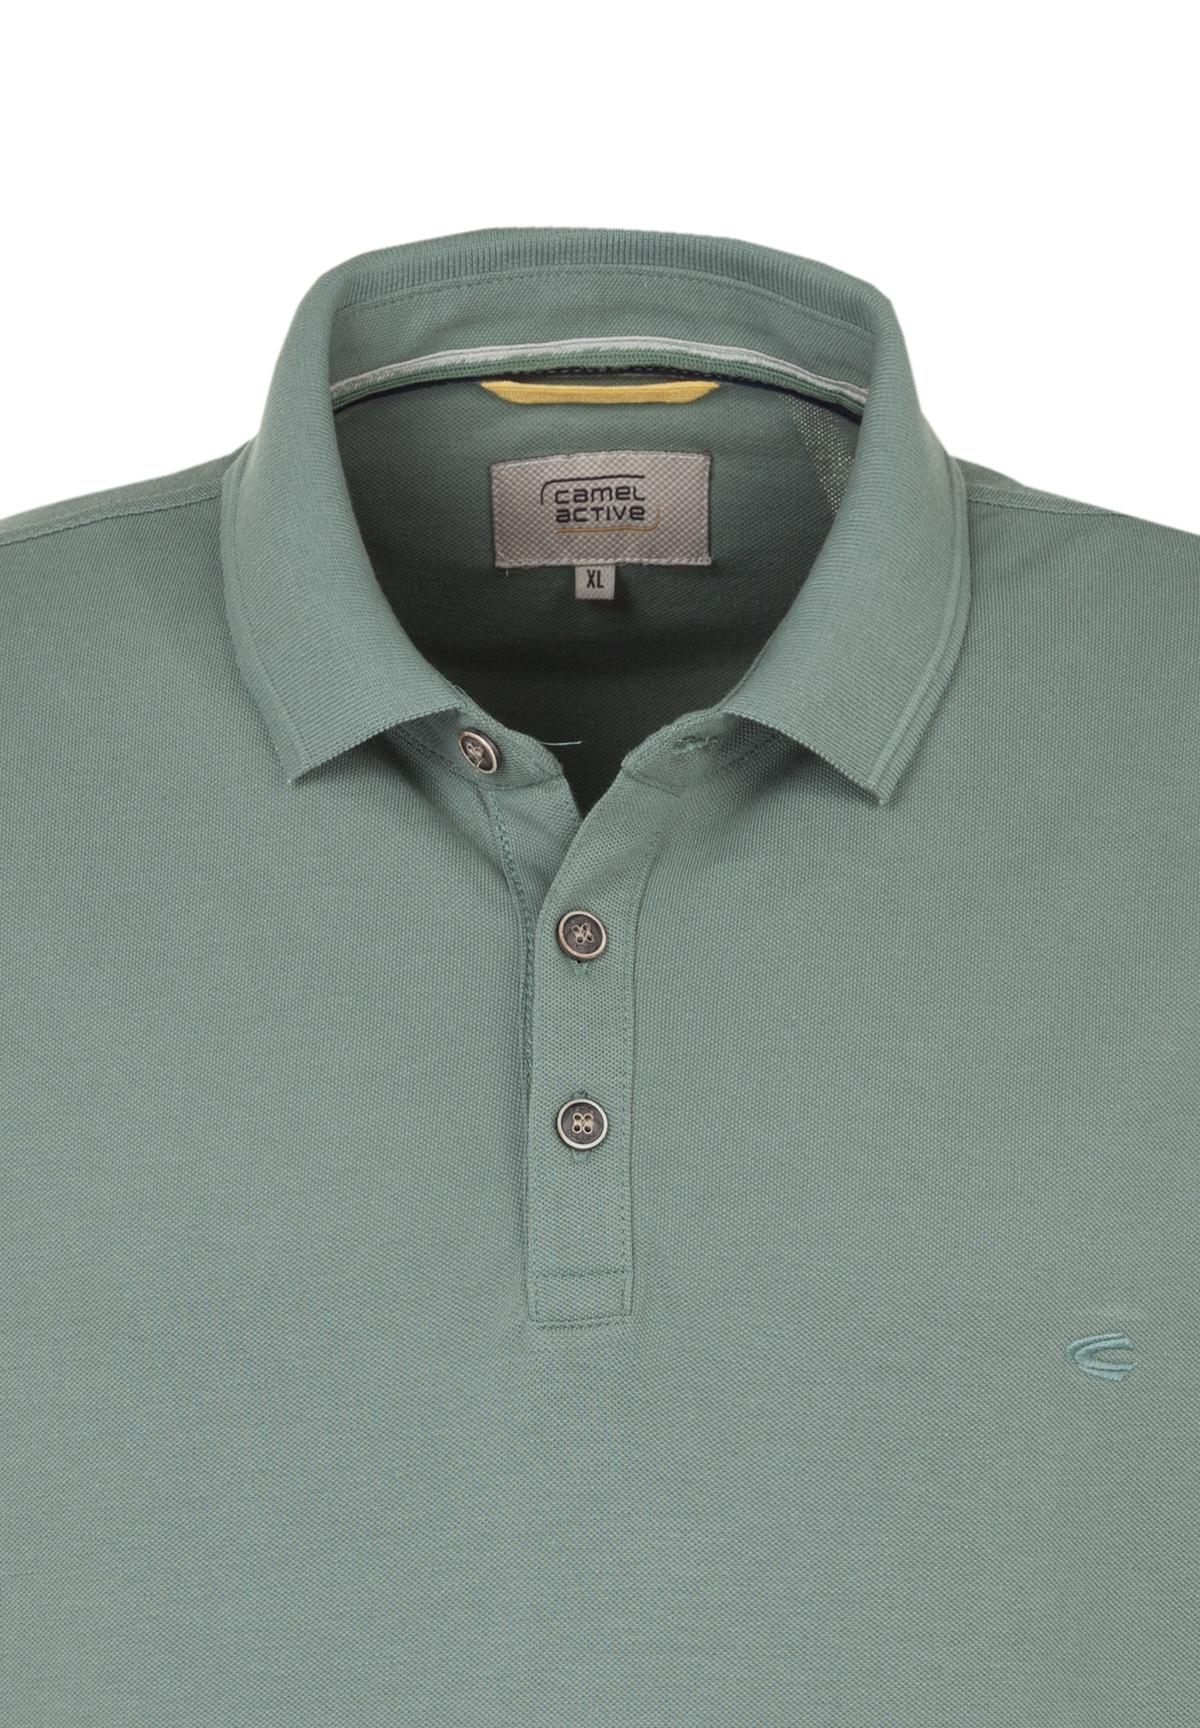 Camel-Active-Herren-Shirt-Poloshirt-Pique-Regular-Fit-NEU Indexbild 90